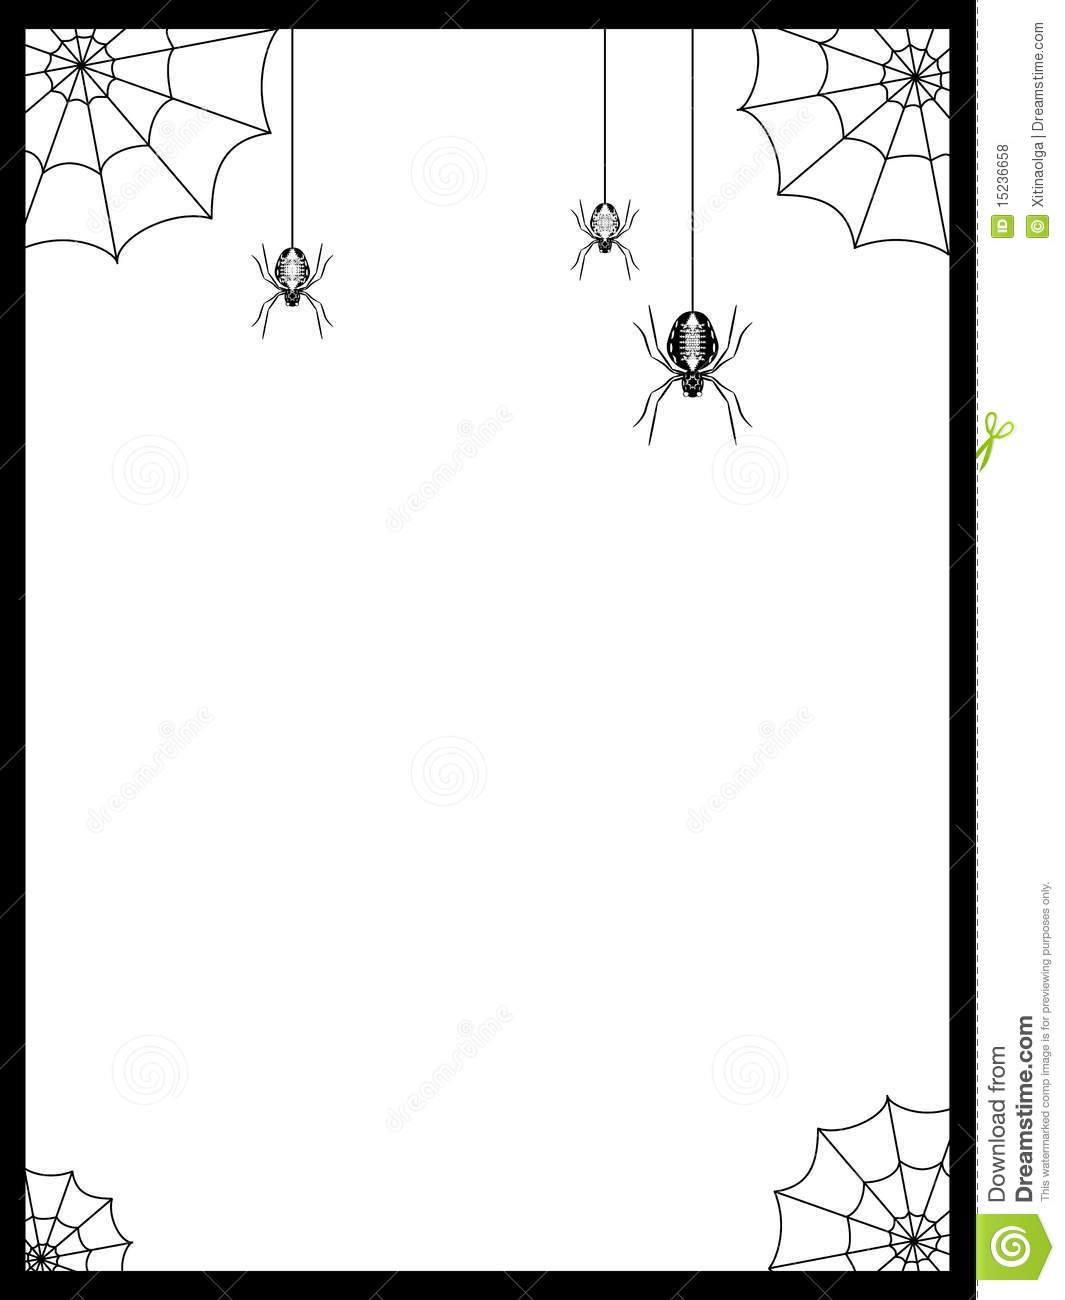 Spider Web clipart border #7